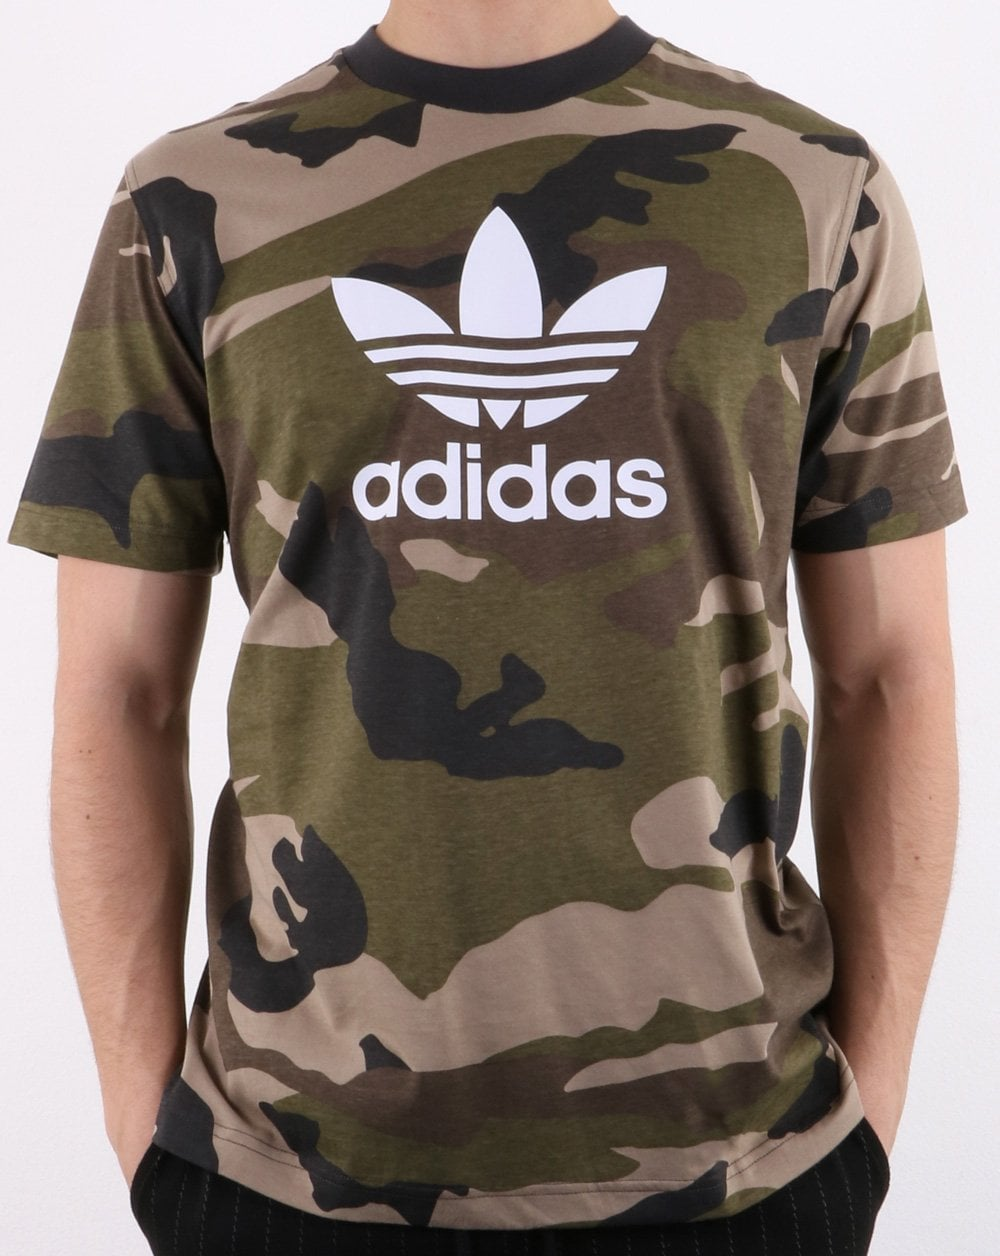 t shirt adidas camouflage